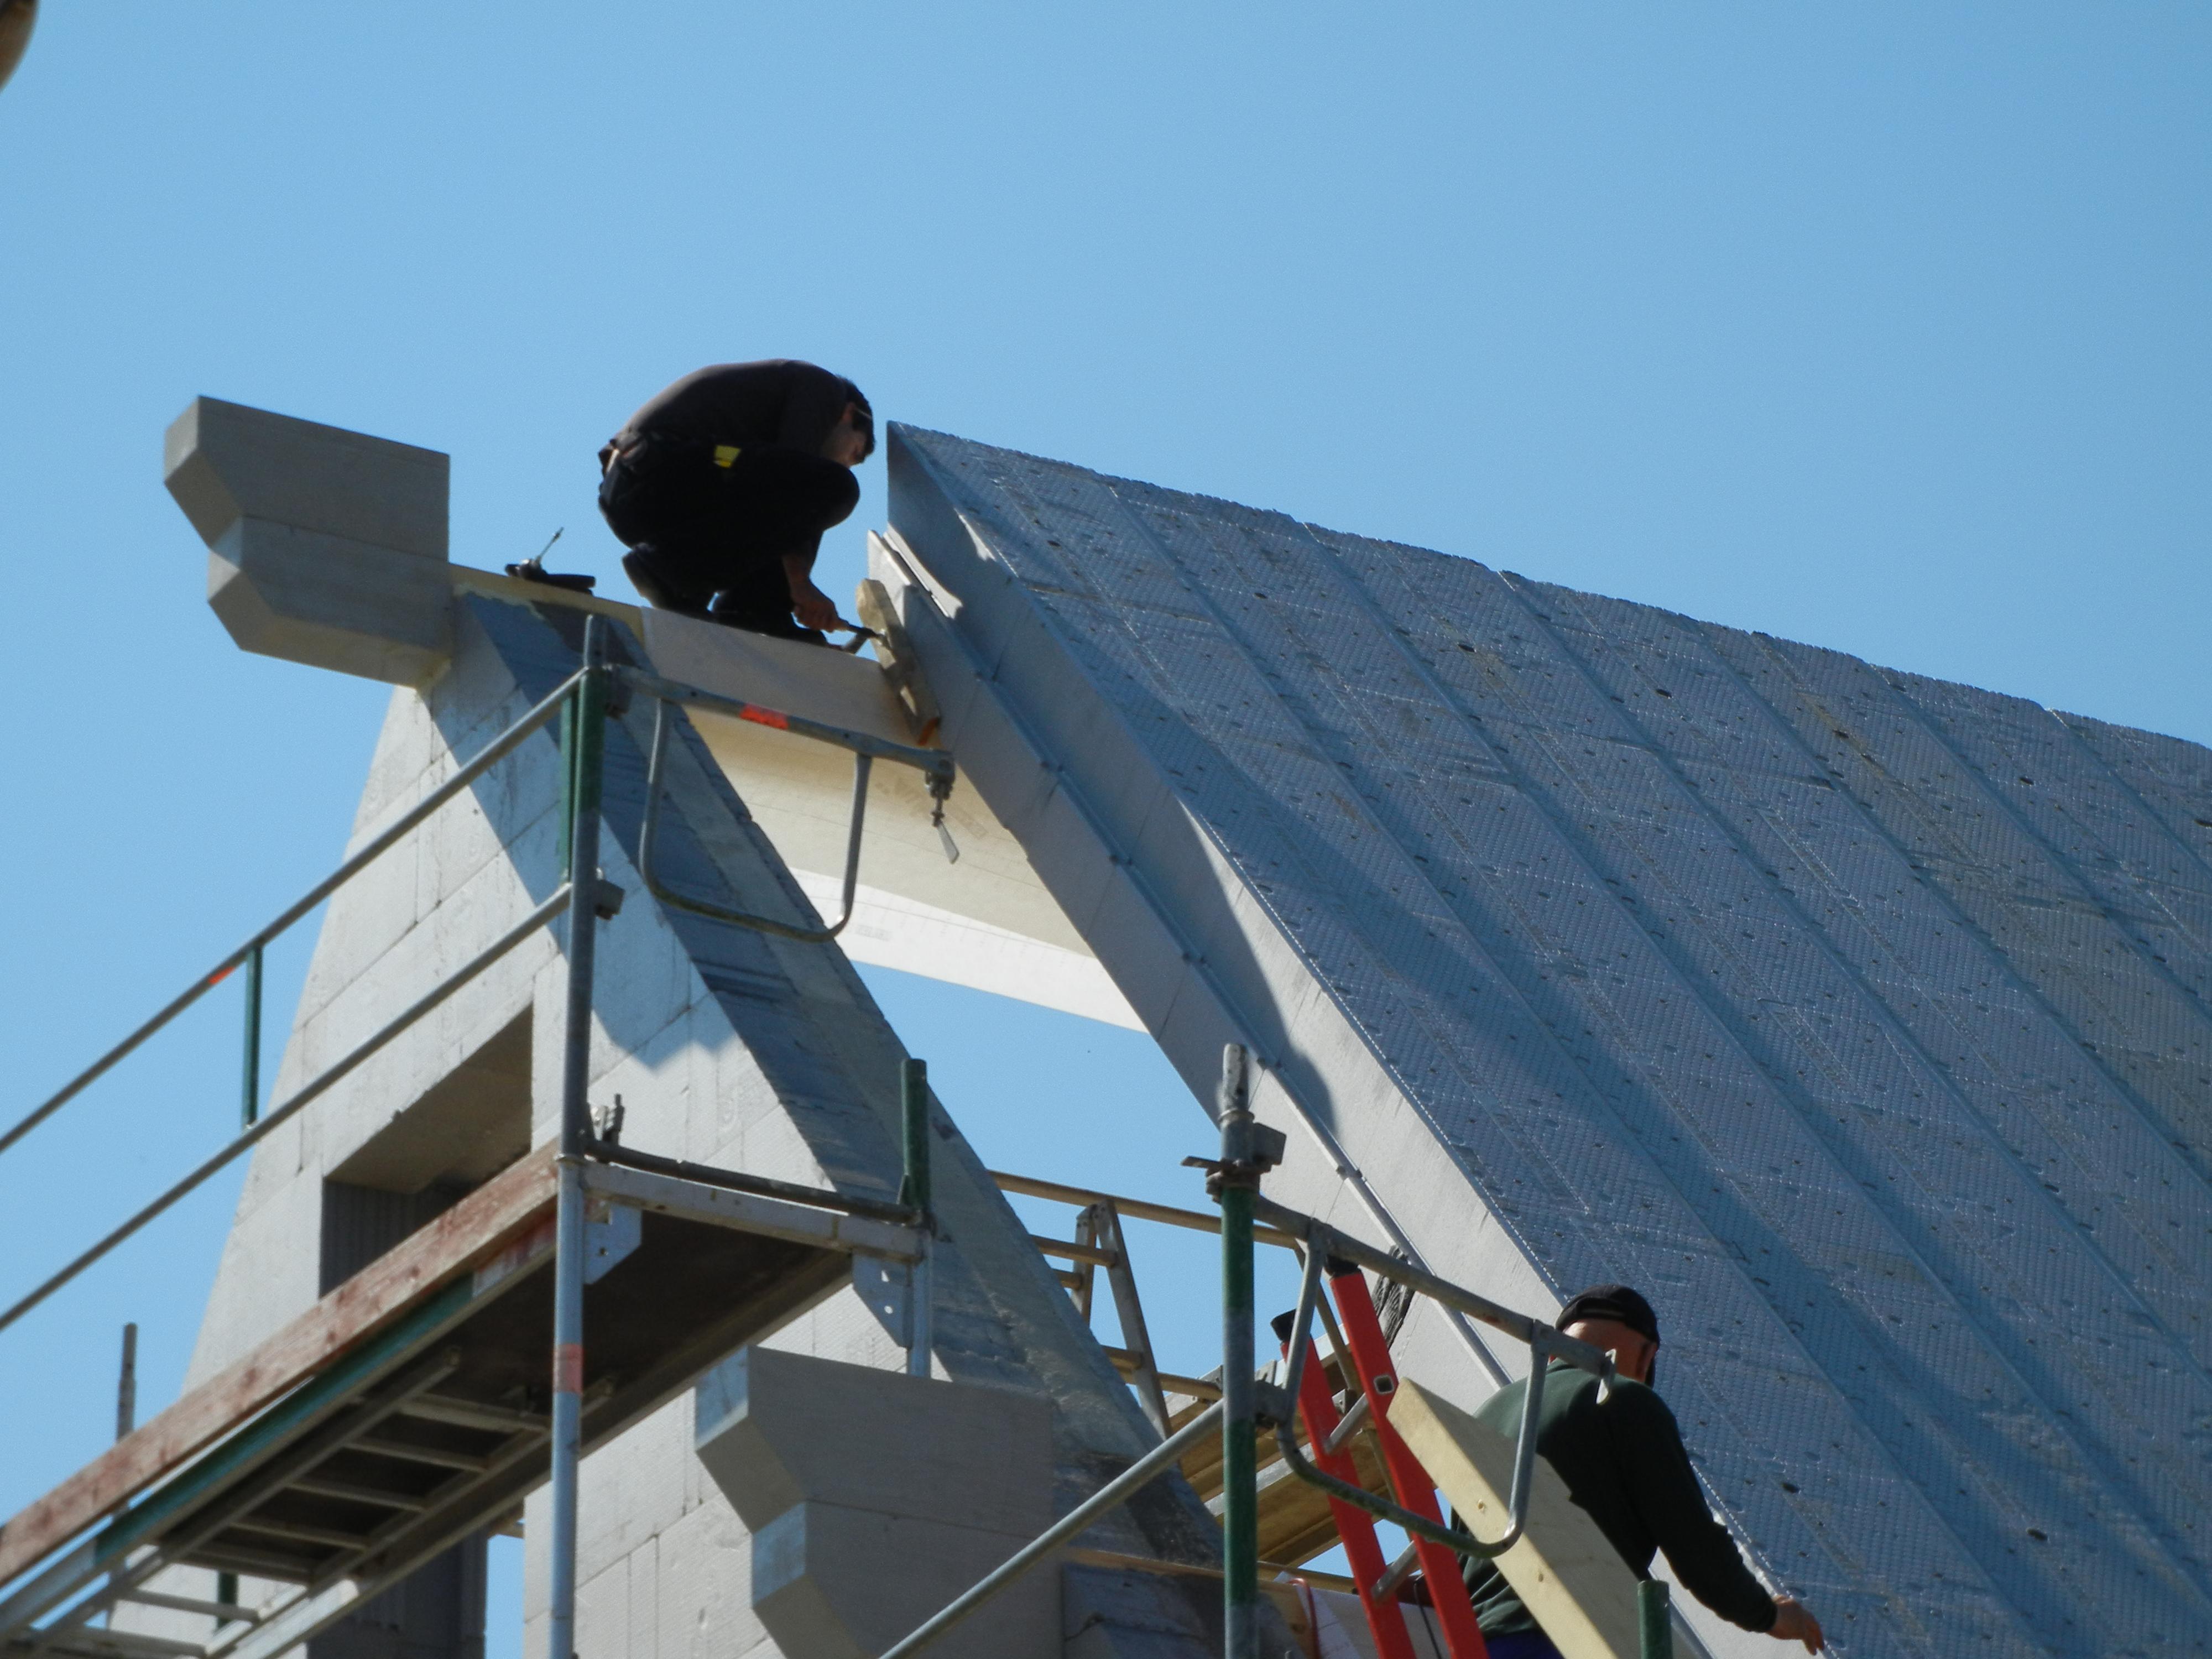 fixieren der fertigen Dachteile